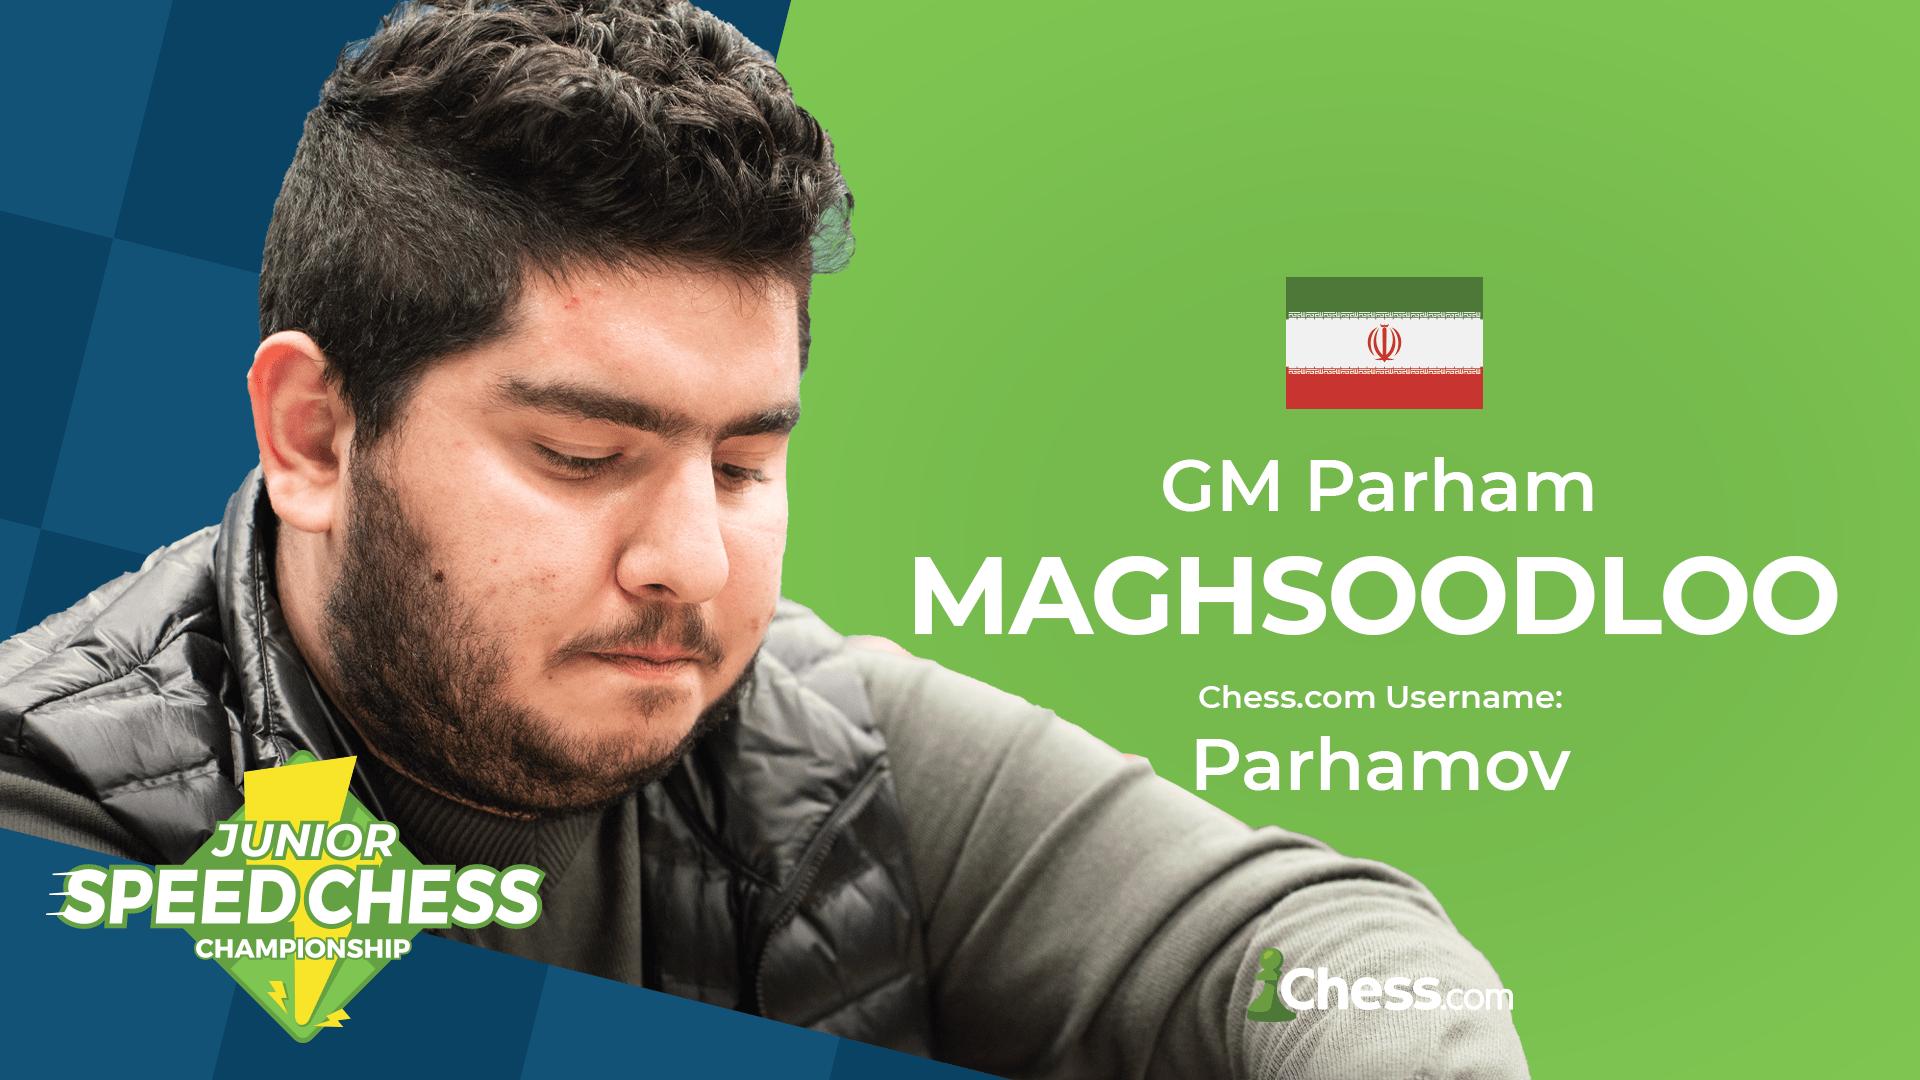 Parham Maghsoodloo